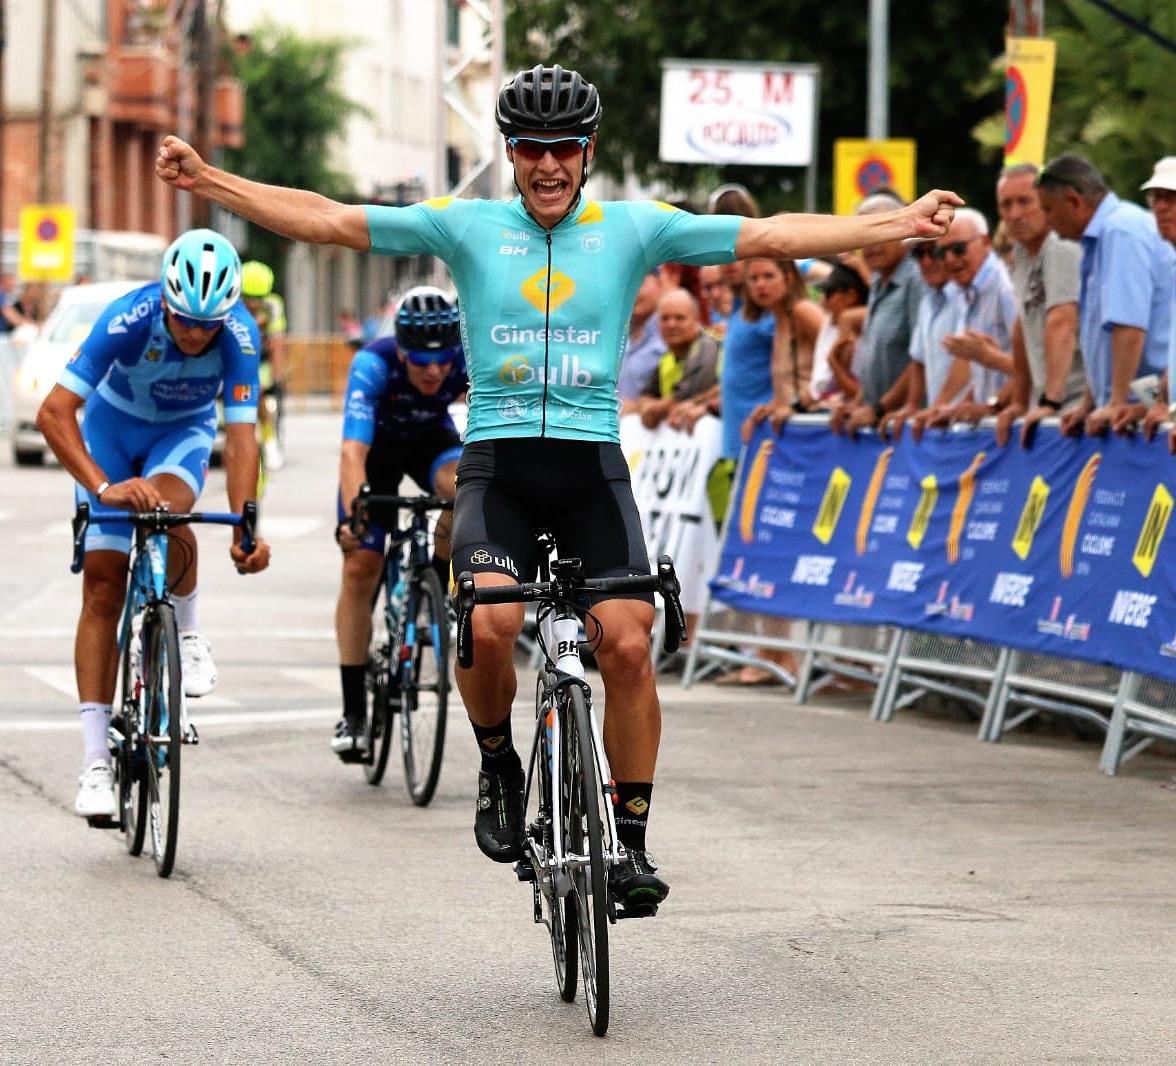 Javier Fuentes Ginestar ULB Trofeu Abelard